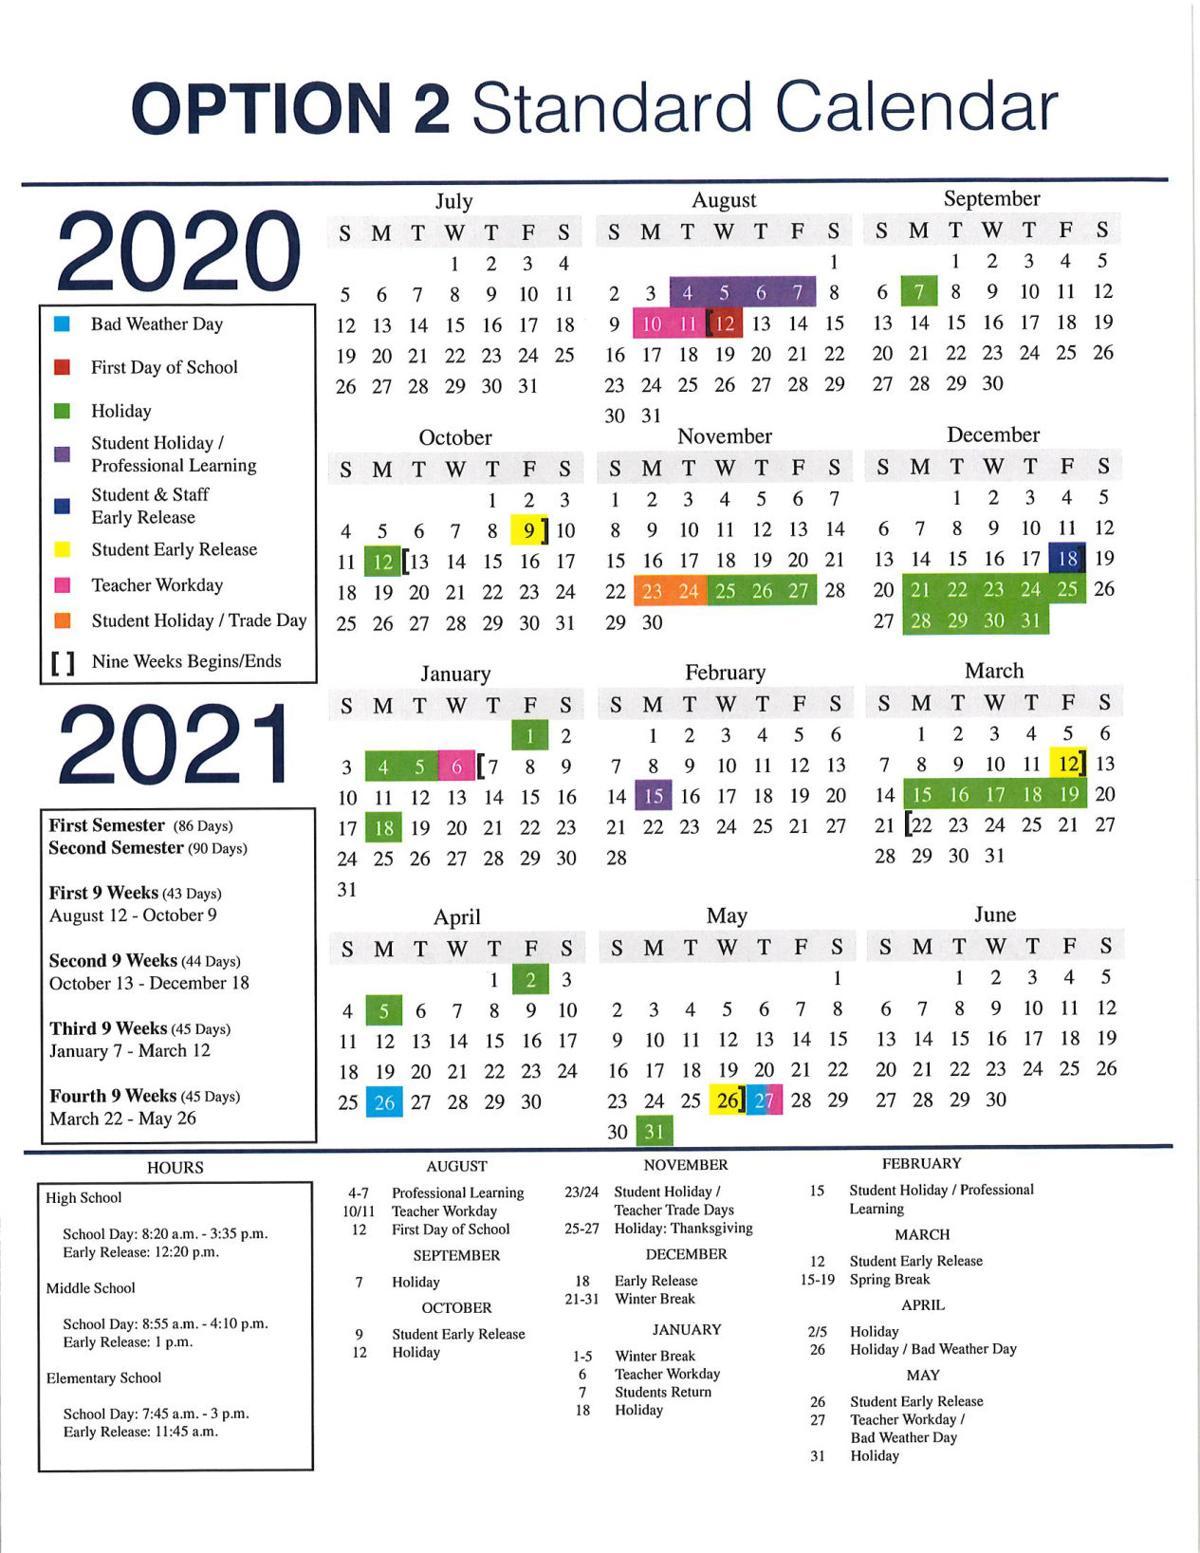 Lisd School Calendar 2021 Here's when LISD students will be in school next year | News